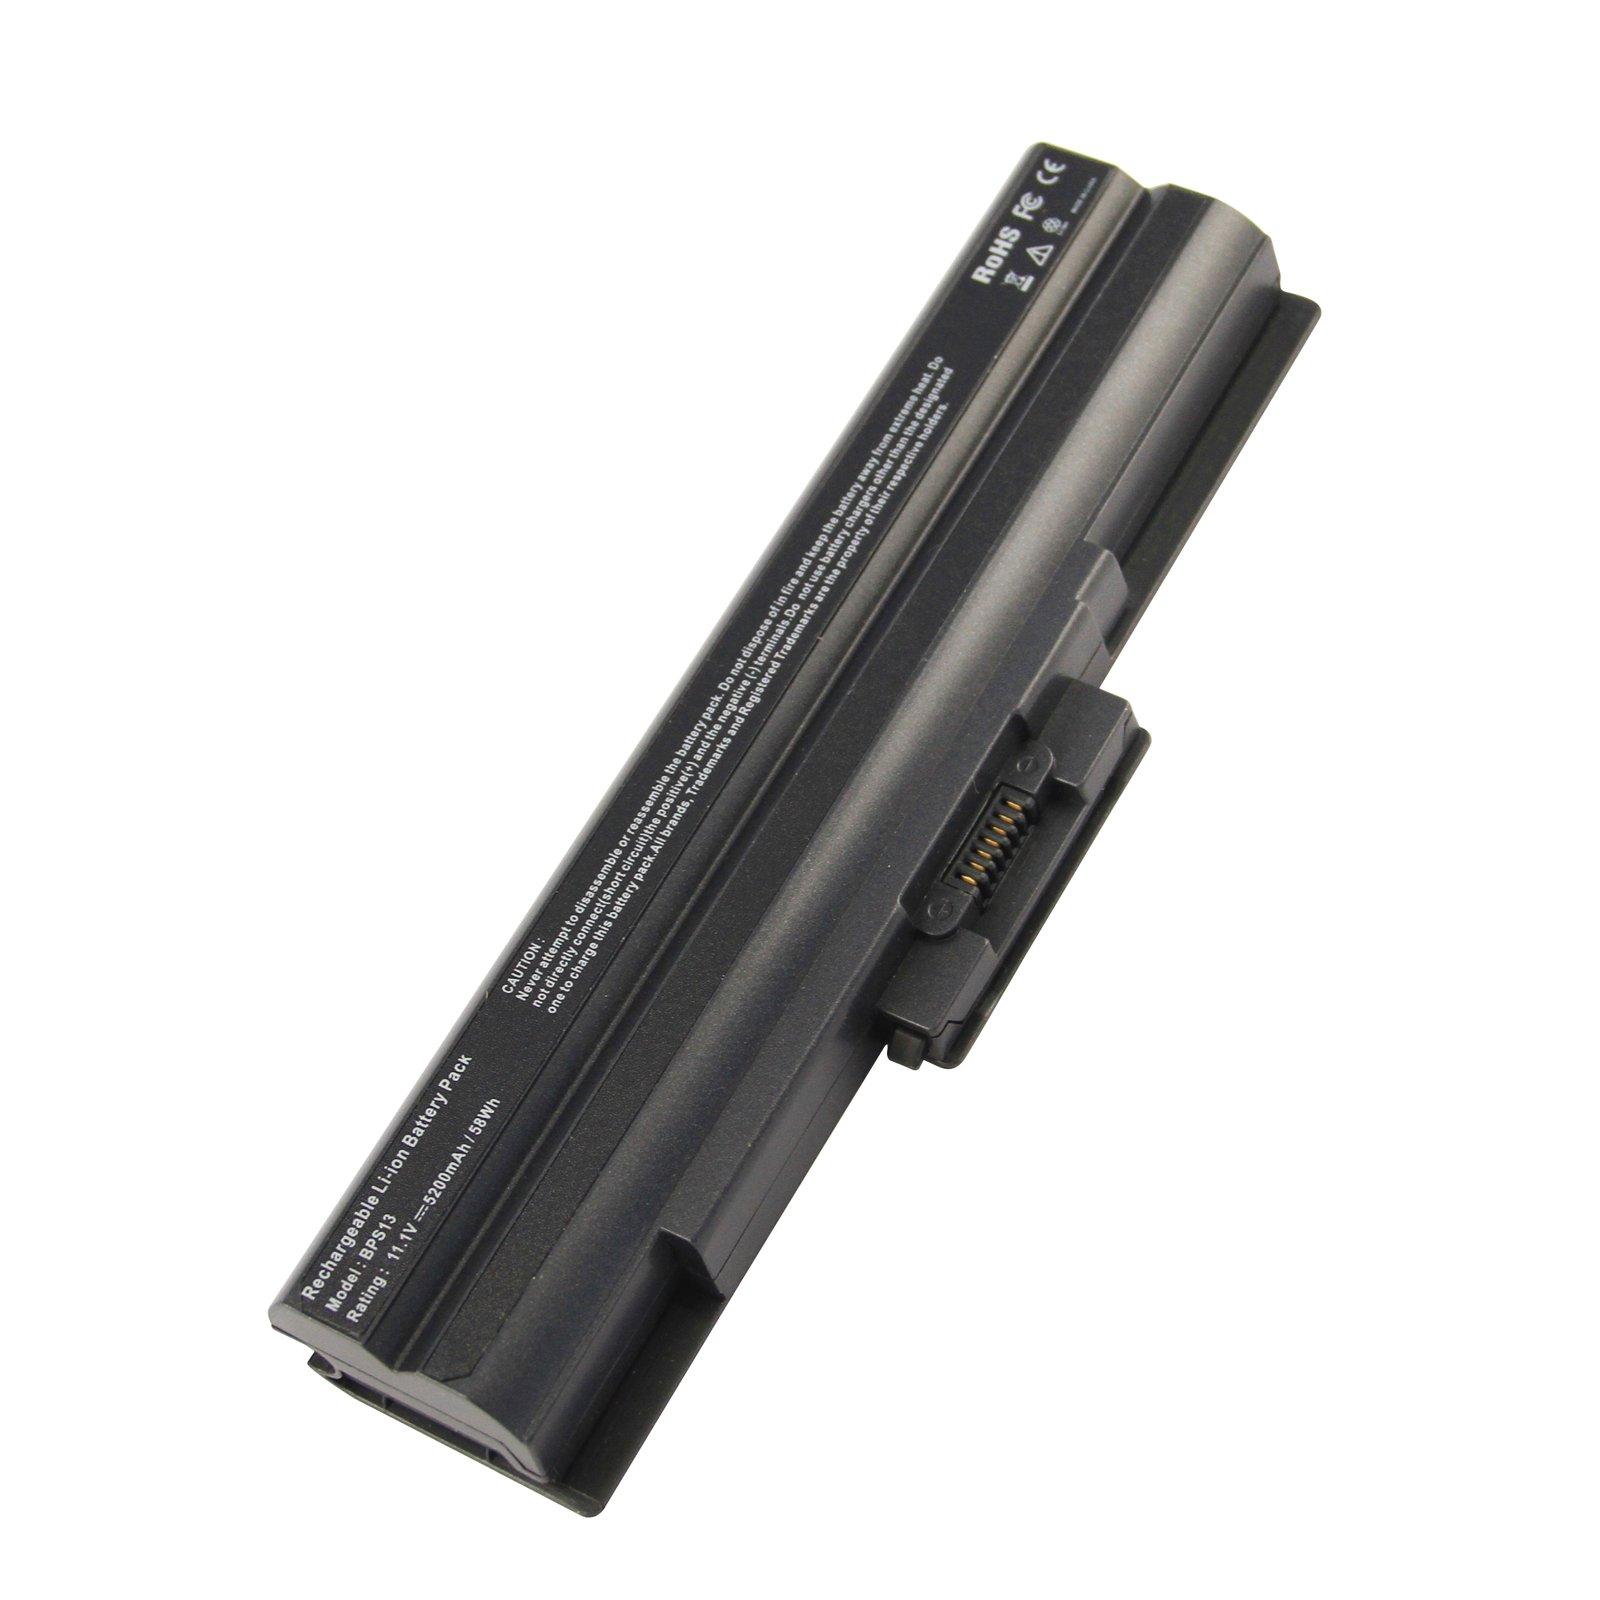 Bateria Bps13 5200mah Para Sony Vaio Vgp-bps13 Vgp-bps13a Vgp-bps13a/b Vgp-bps13a/q Vgp-bps13a/r Vgp-bps13/b Vgp-bps13b/